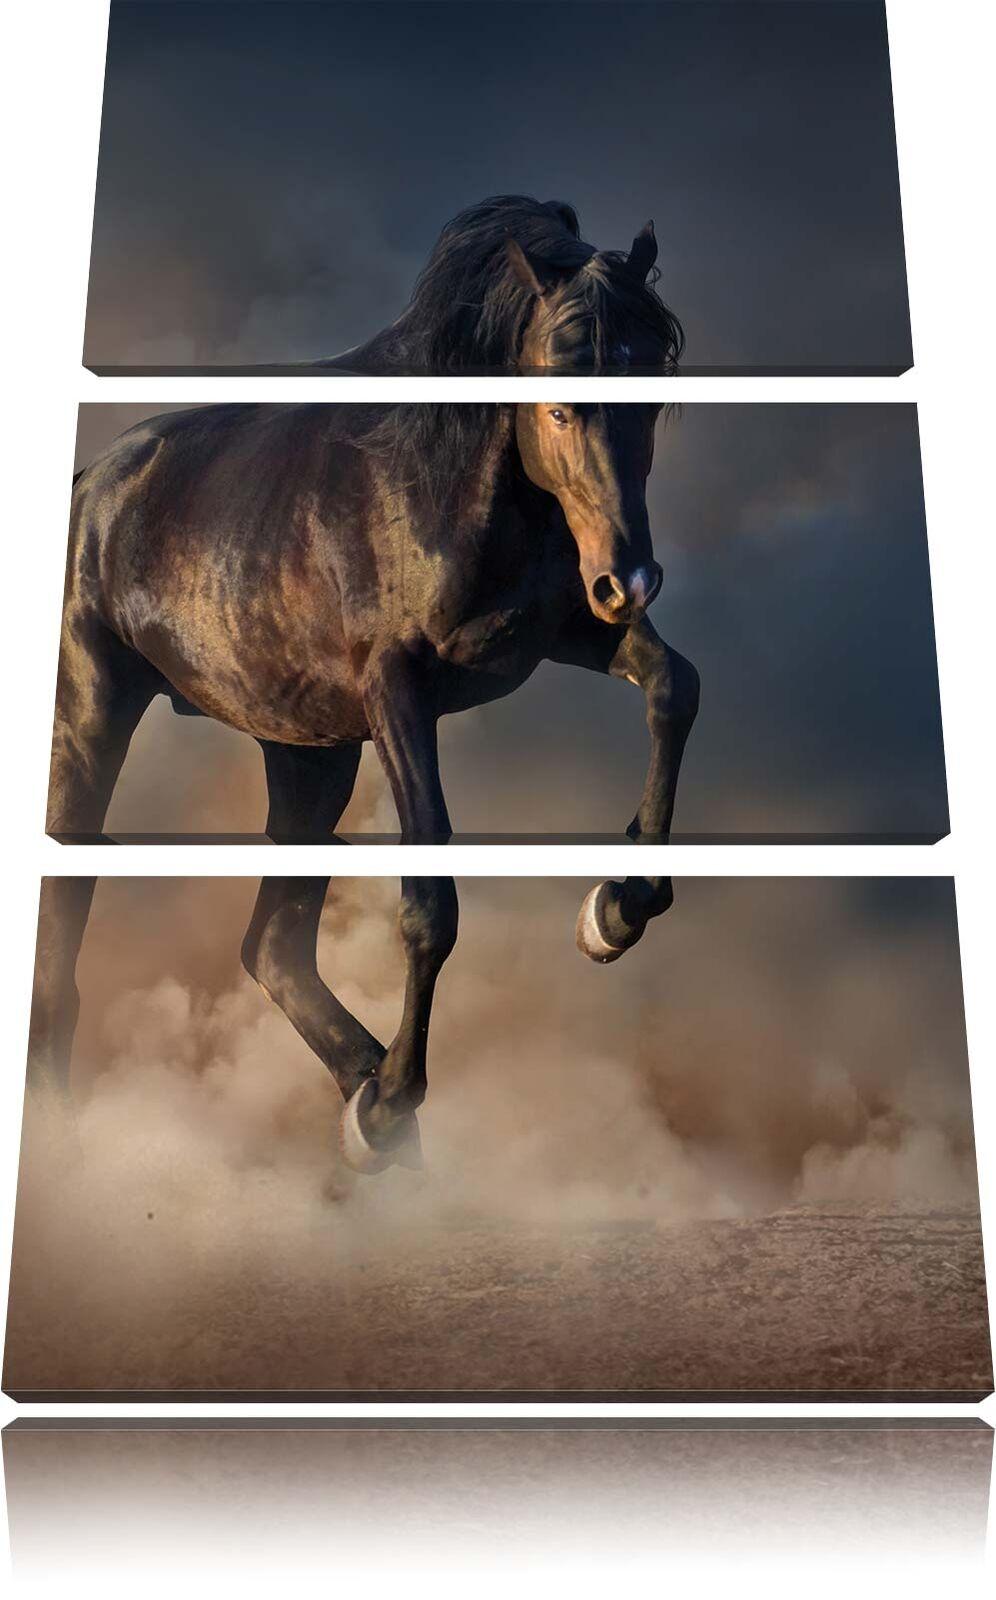 Nero Cavallo 3-teiler Quadro su Tel